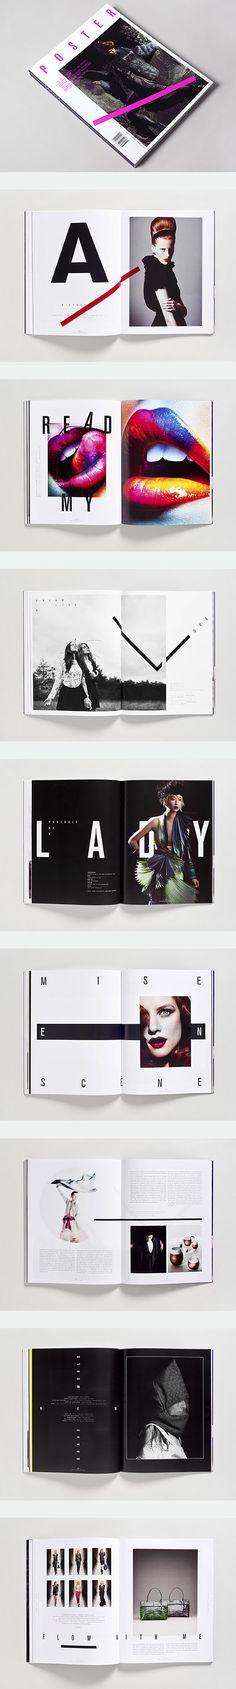 Poster Magazine by Toko Design.